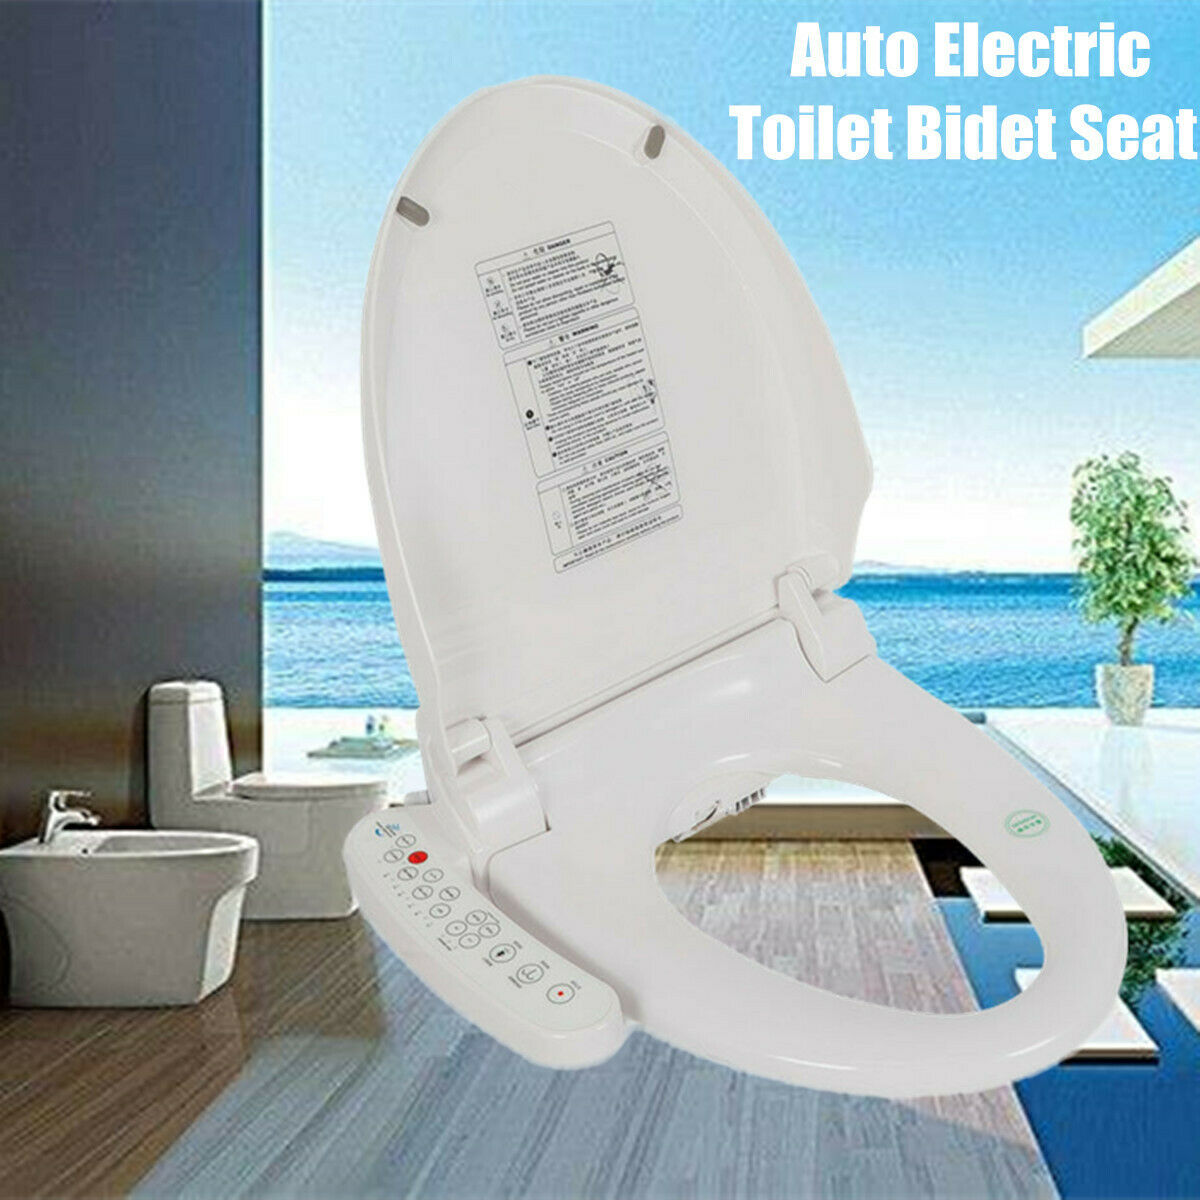 Izen Smart Cleanser Izen 7500 Bidet Toilet Seat Elongated For Sale Online Ebay